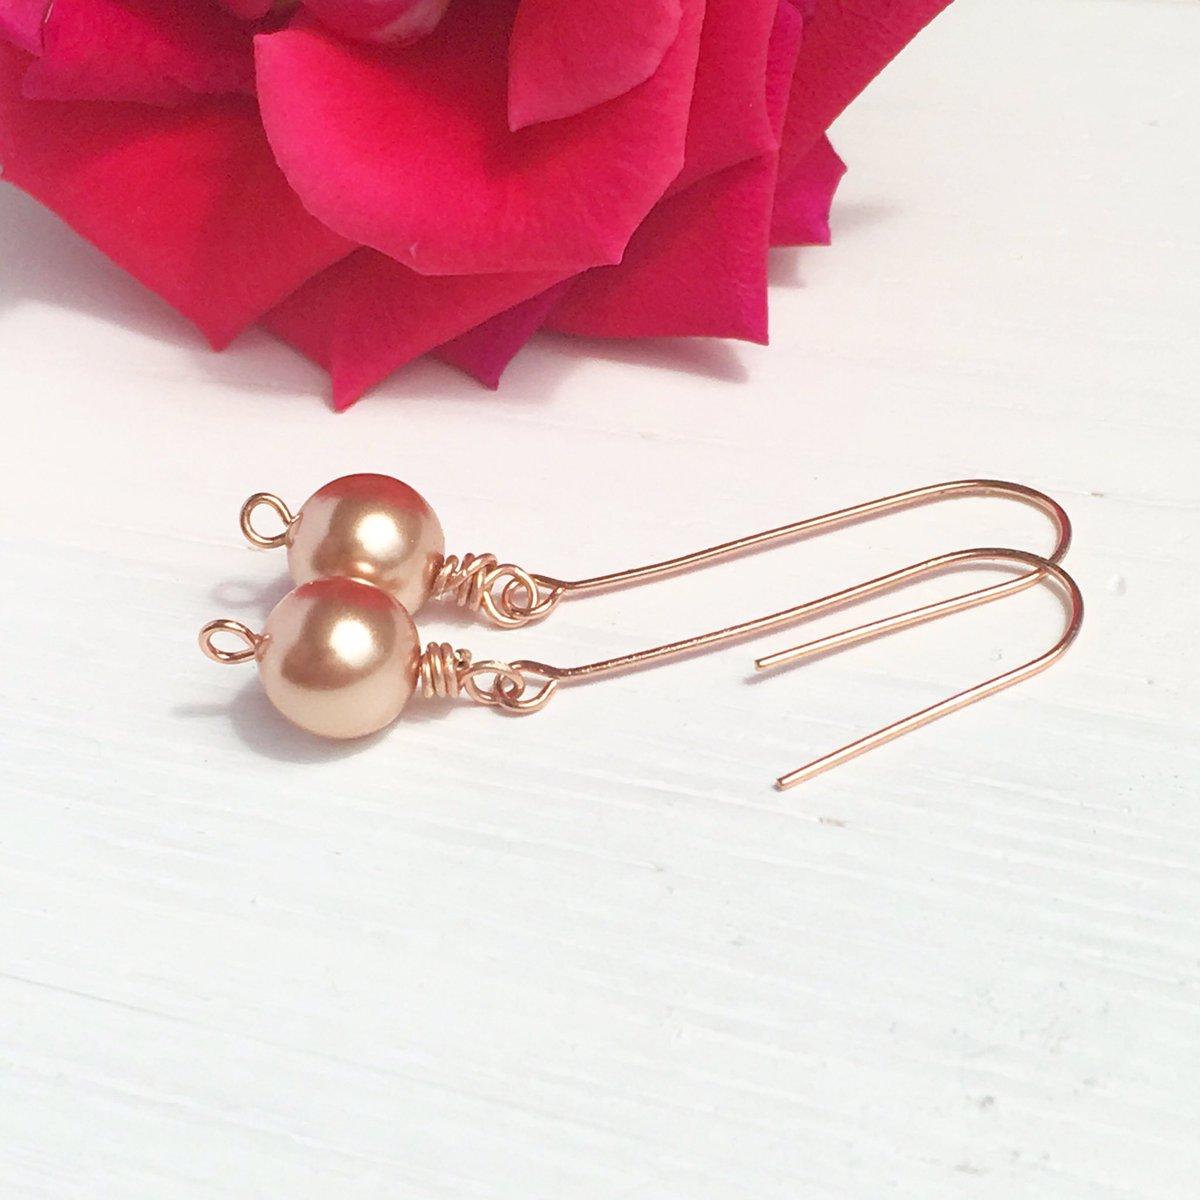 Rose gold pearls. Breathtaking.    https://www. etsy.com/madebymissm/li sting/526785176/rose-gold-pearl-earrings-blush-earrings &nbsp; …   #madebymissm #londonislovinit #etsychaching #etsyclub #etsyfinds #forsale <br>http://pic.twitter.com/inie2zSuim